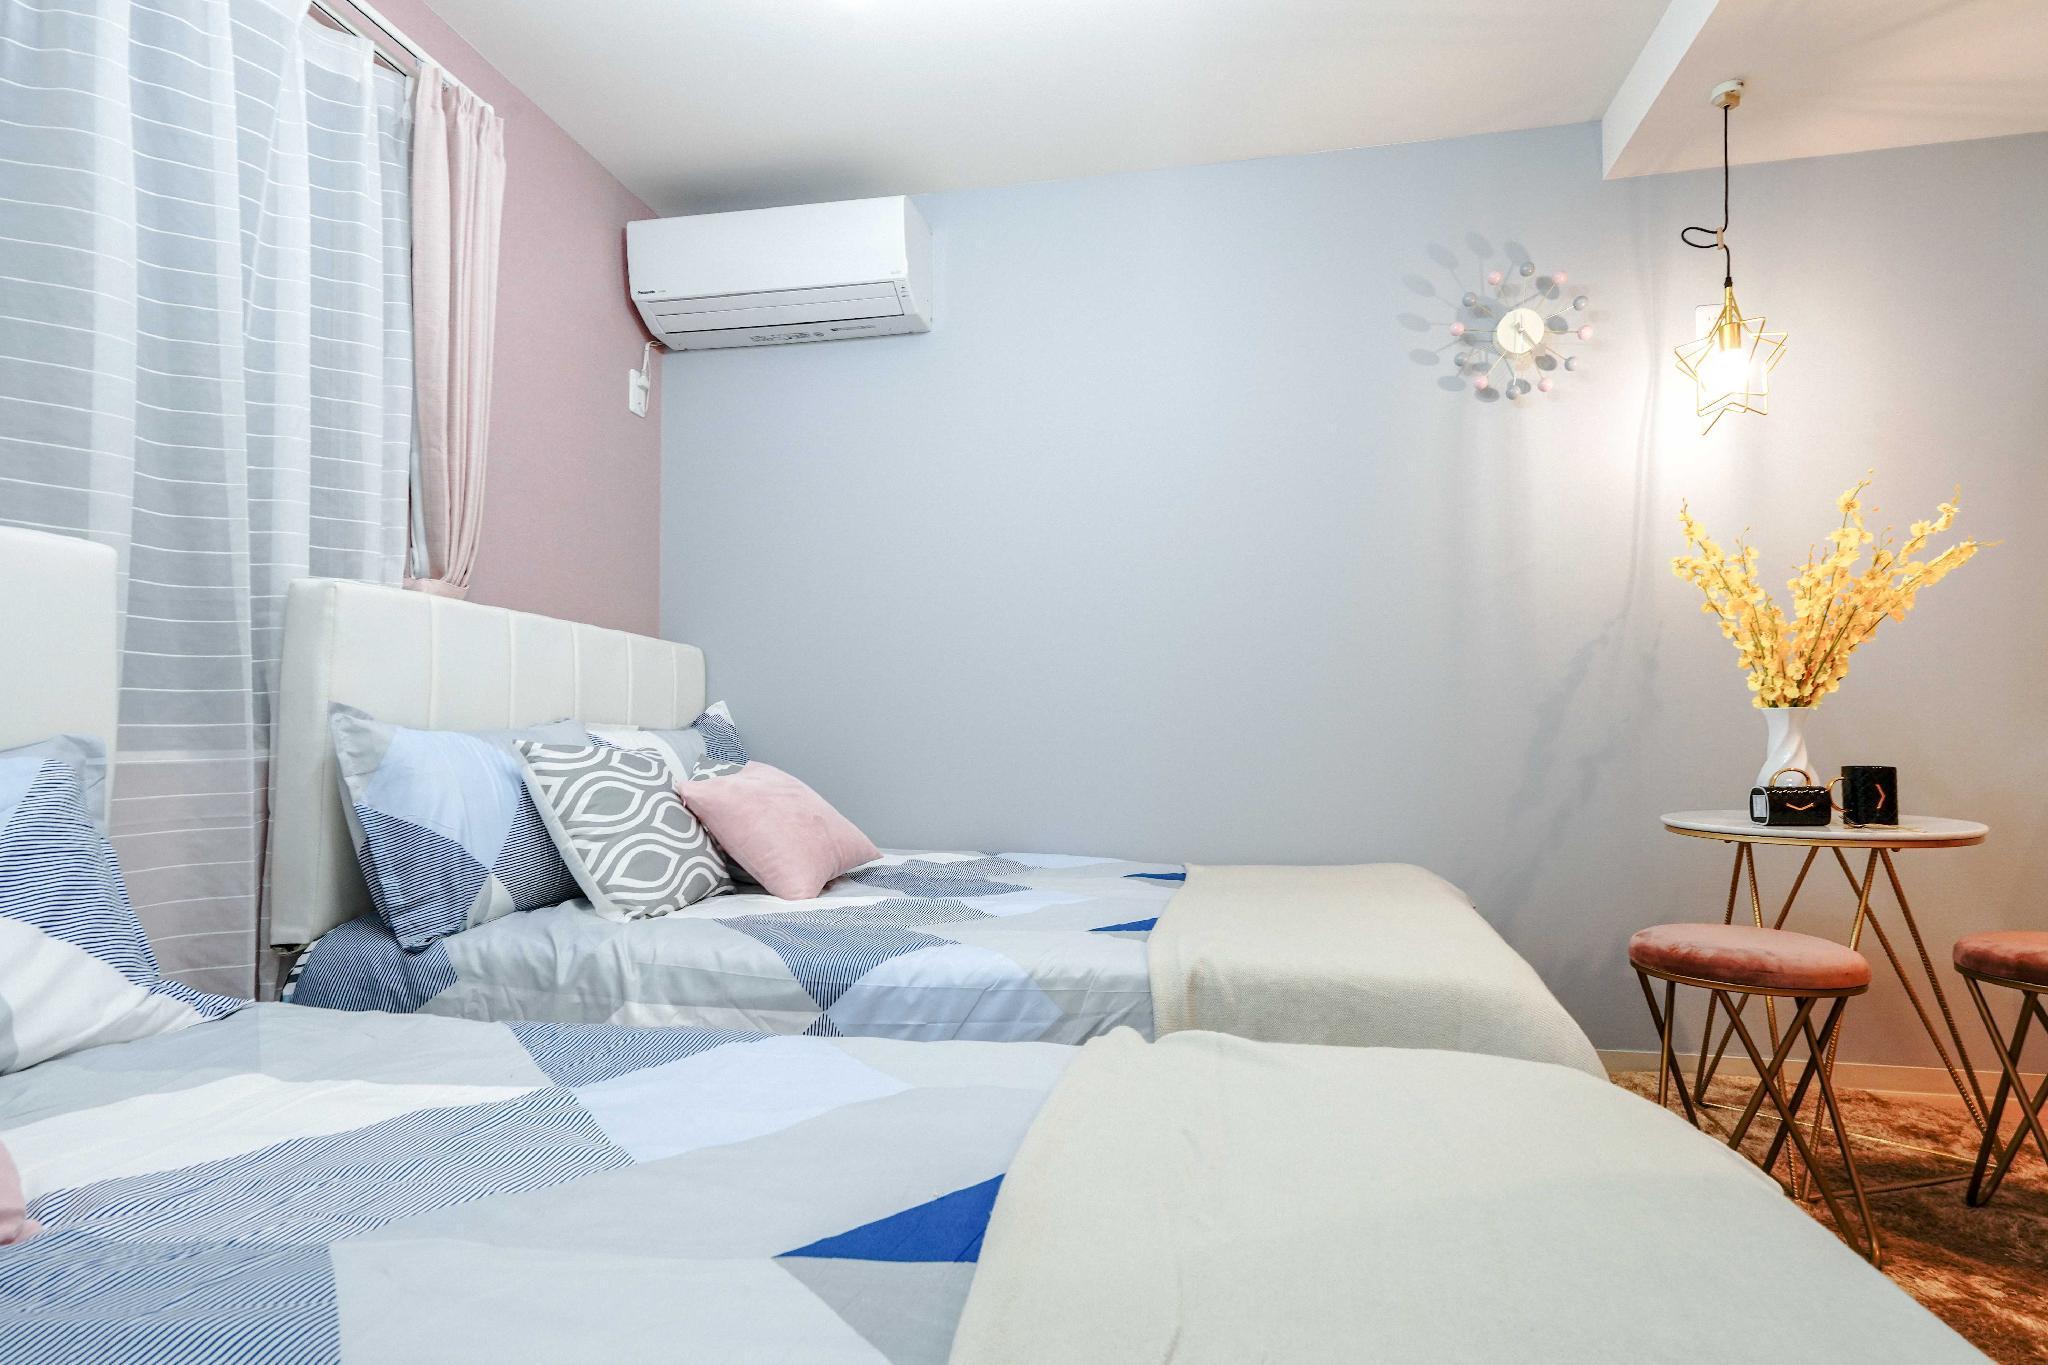 301 New Modern Economy Cozy Room Ikebukuro 4ppl